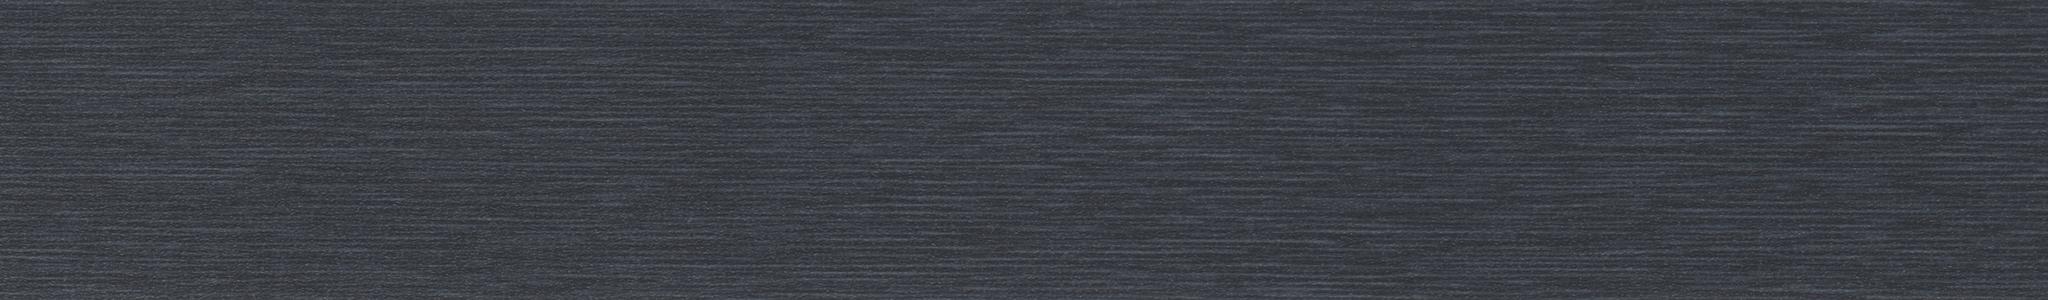 HD 296141 Кромка ABS Алюкс Черный - Гладкая